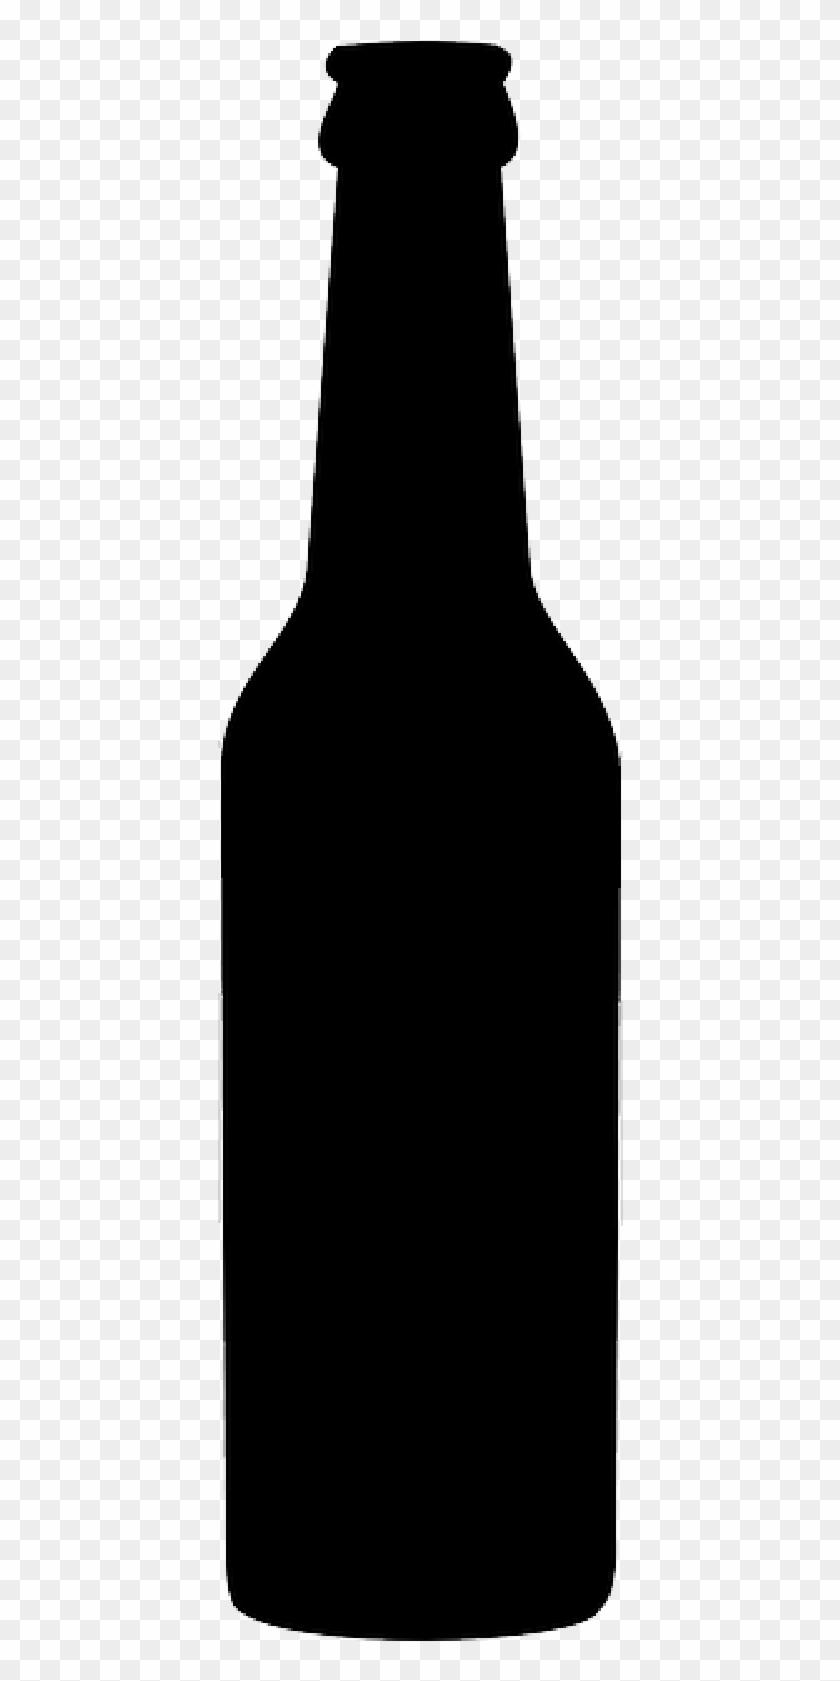 beer bottle cliparts free download clip art free clip glass bottle rh clipartmax com beer bottle clip art free in a jpg file beer bottle clipart jpg